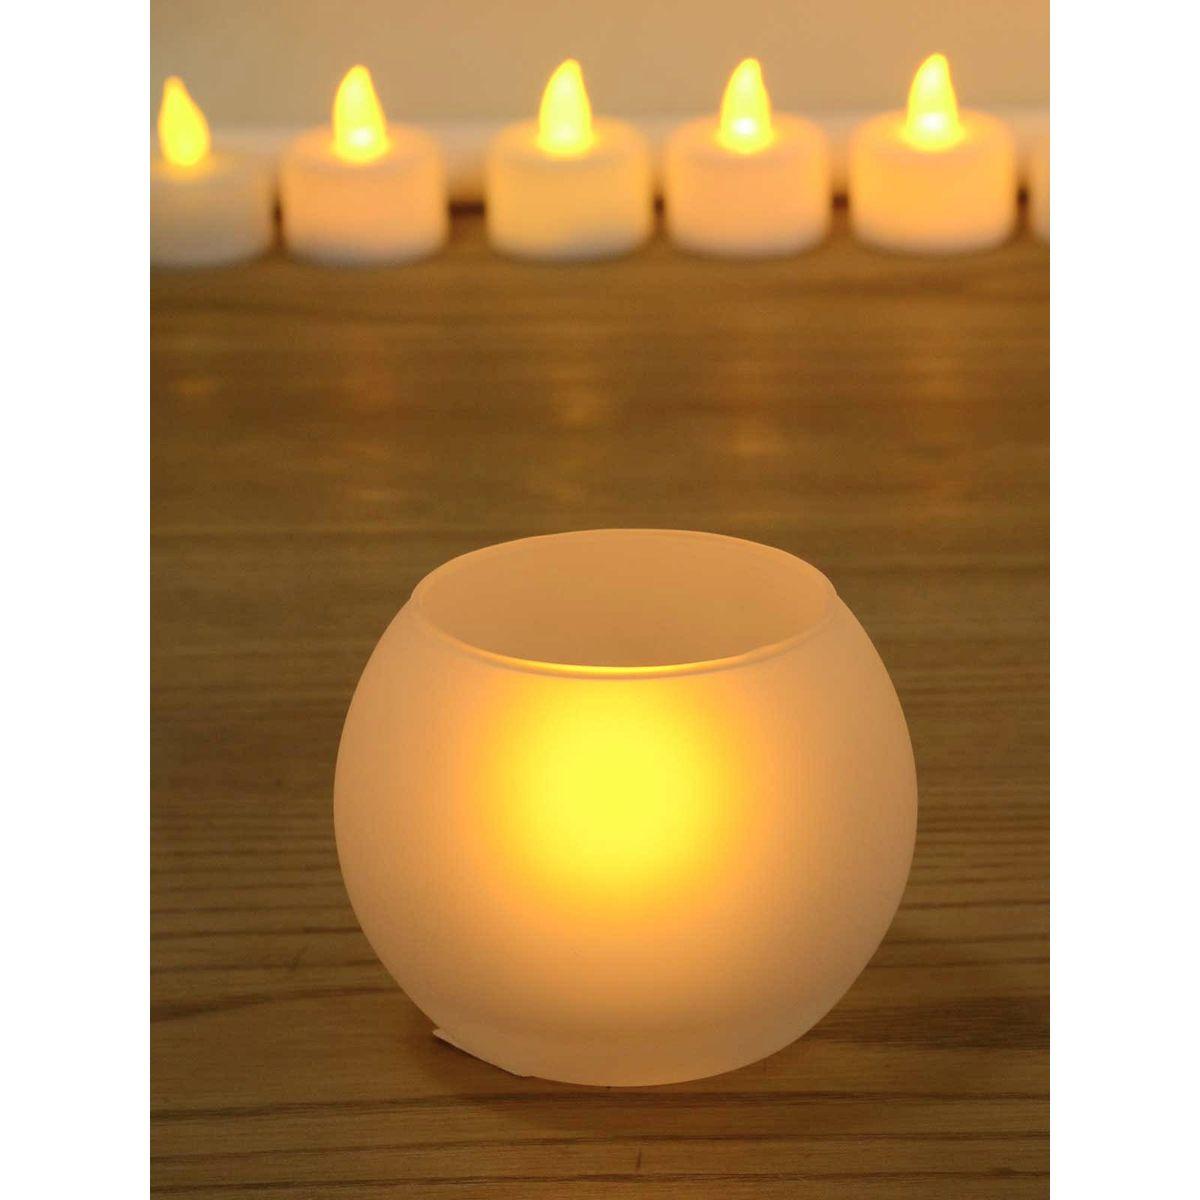 White Glass Candle/Diya Holder - 3 x 2.5 Inches